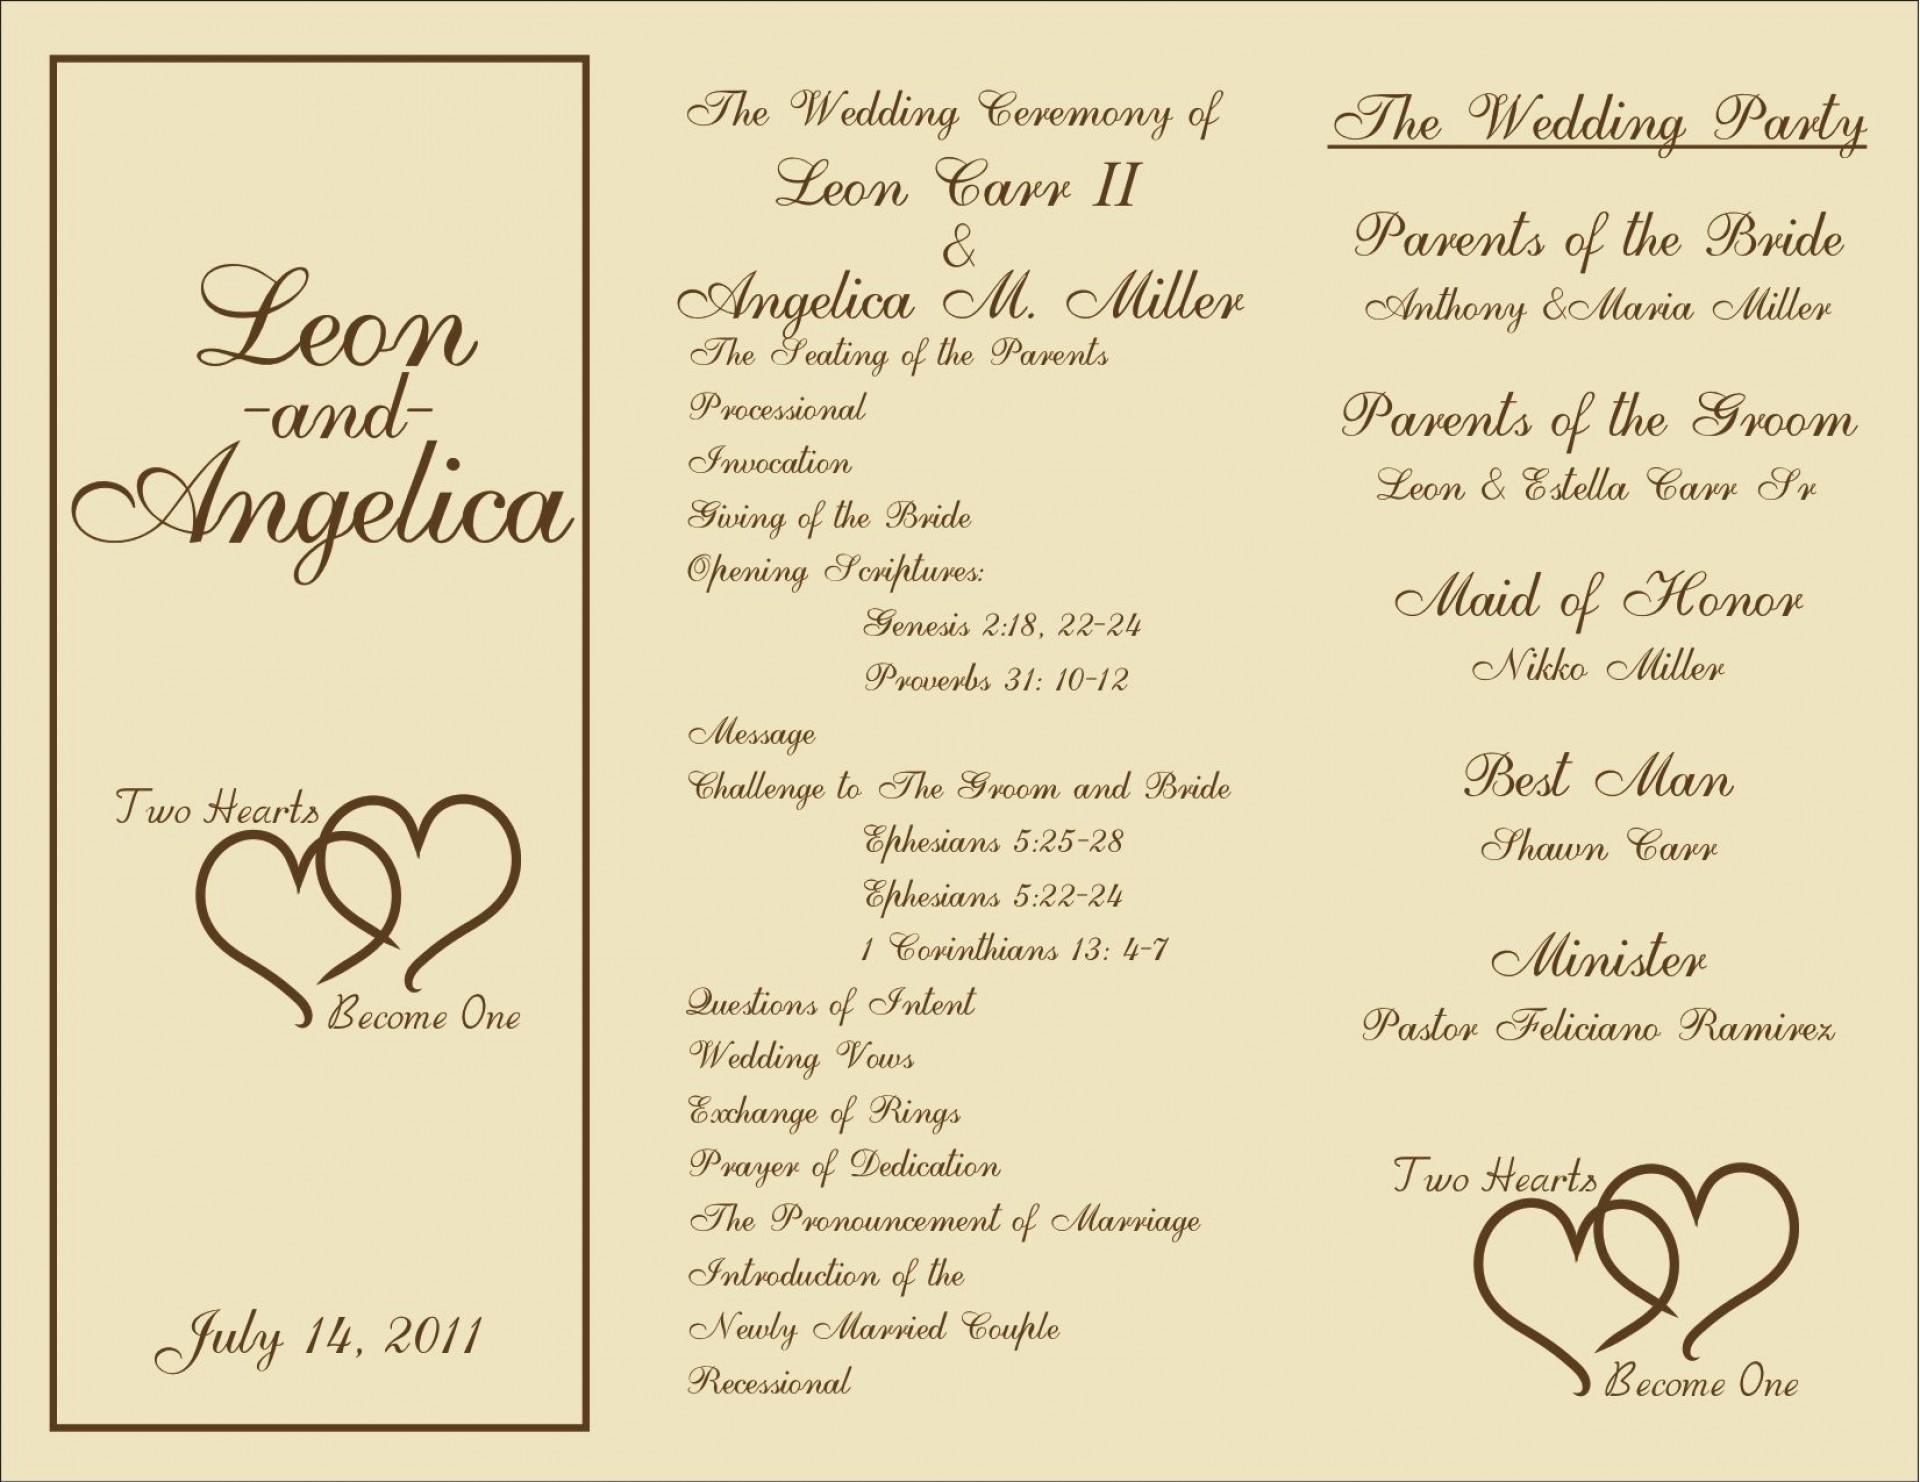 005 Marvelou Free Template For Wedding Ceremony Program Concept 1920